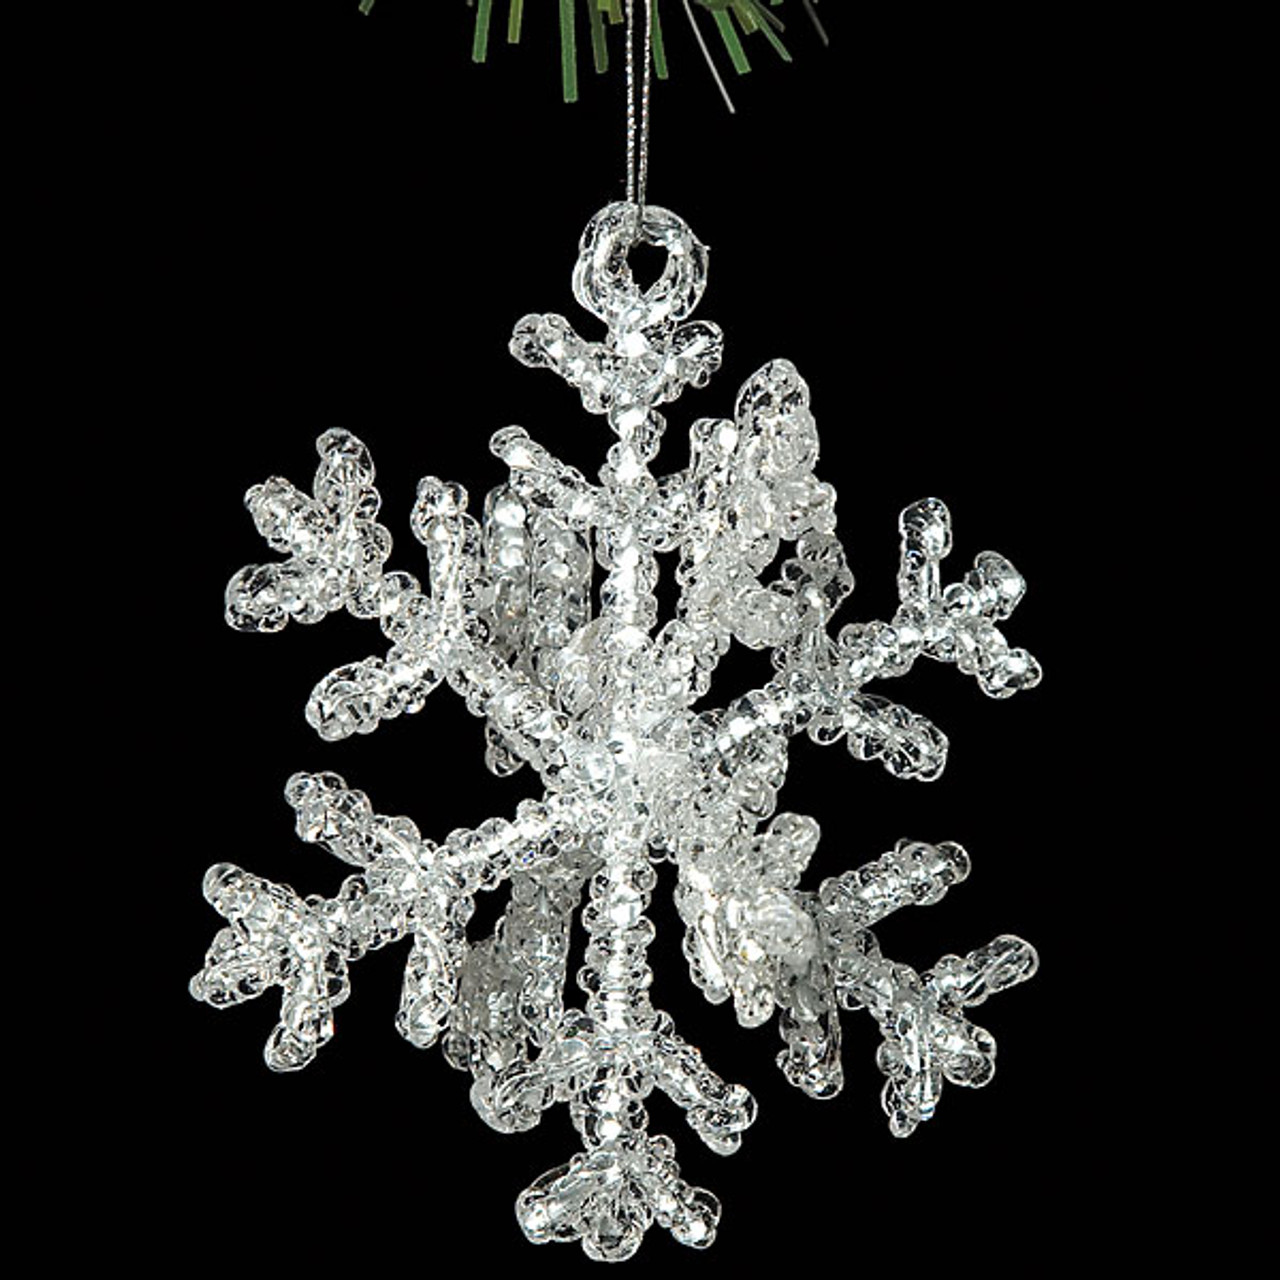 Acrylic D Snowflake Ornament Clear D Snowflake Ornaments Bulk - Acrylic chandelier crystals bulk